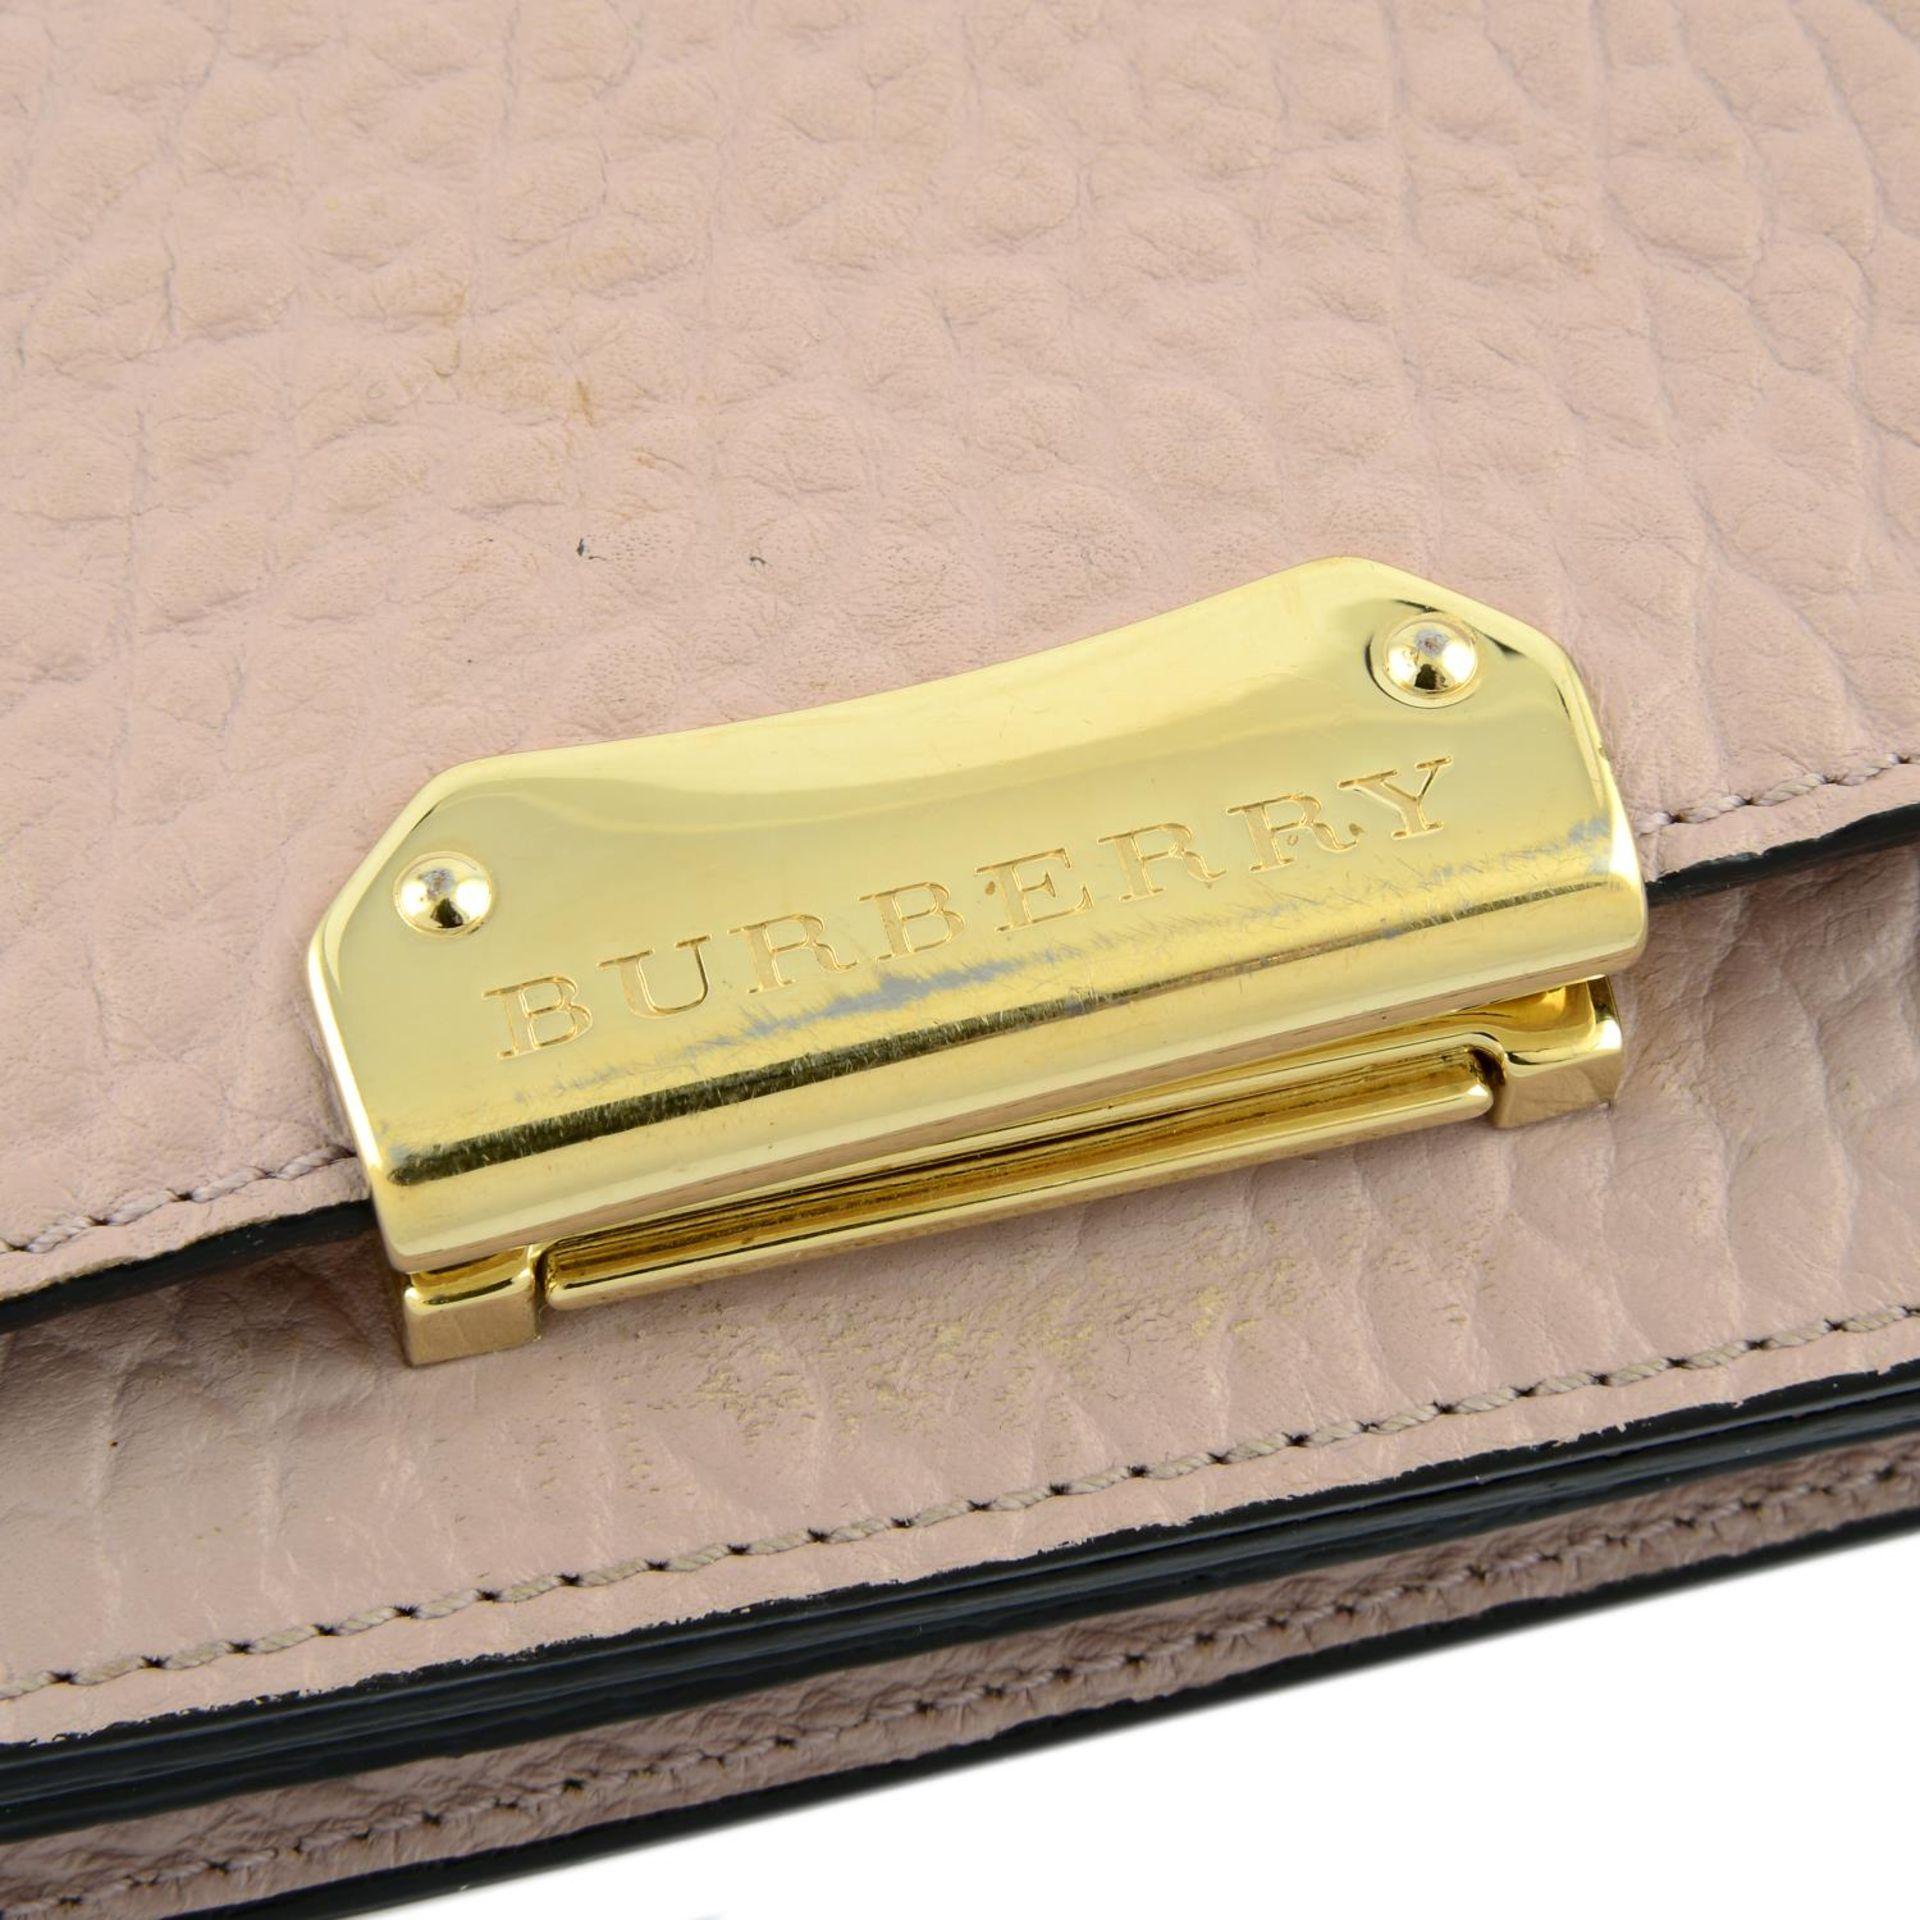 BURBERRY - pink Madison Wallet On Chain handbag. - Image 5 of 5